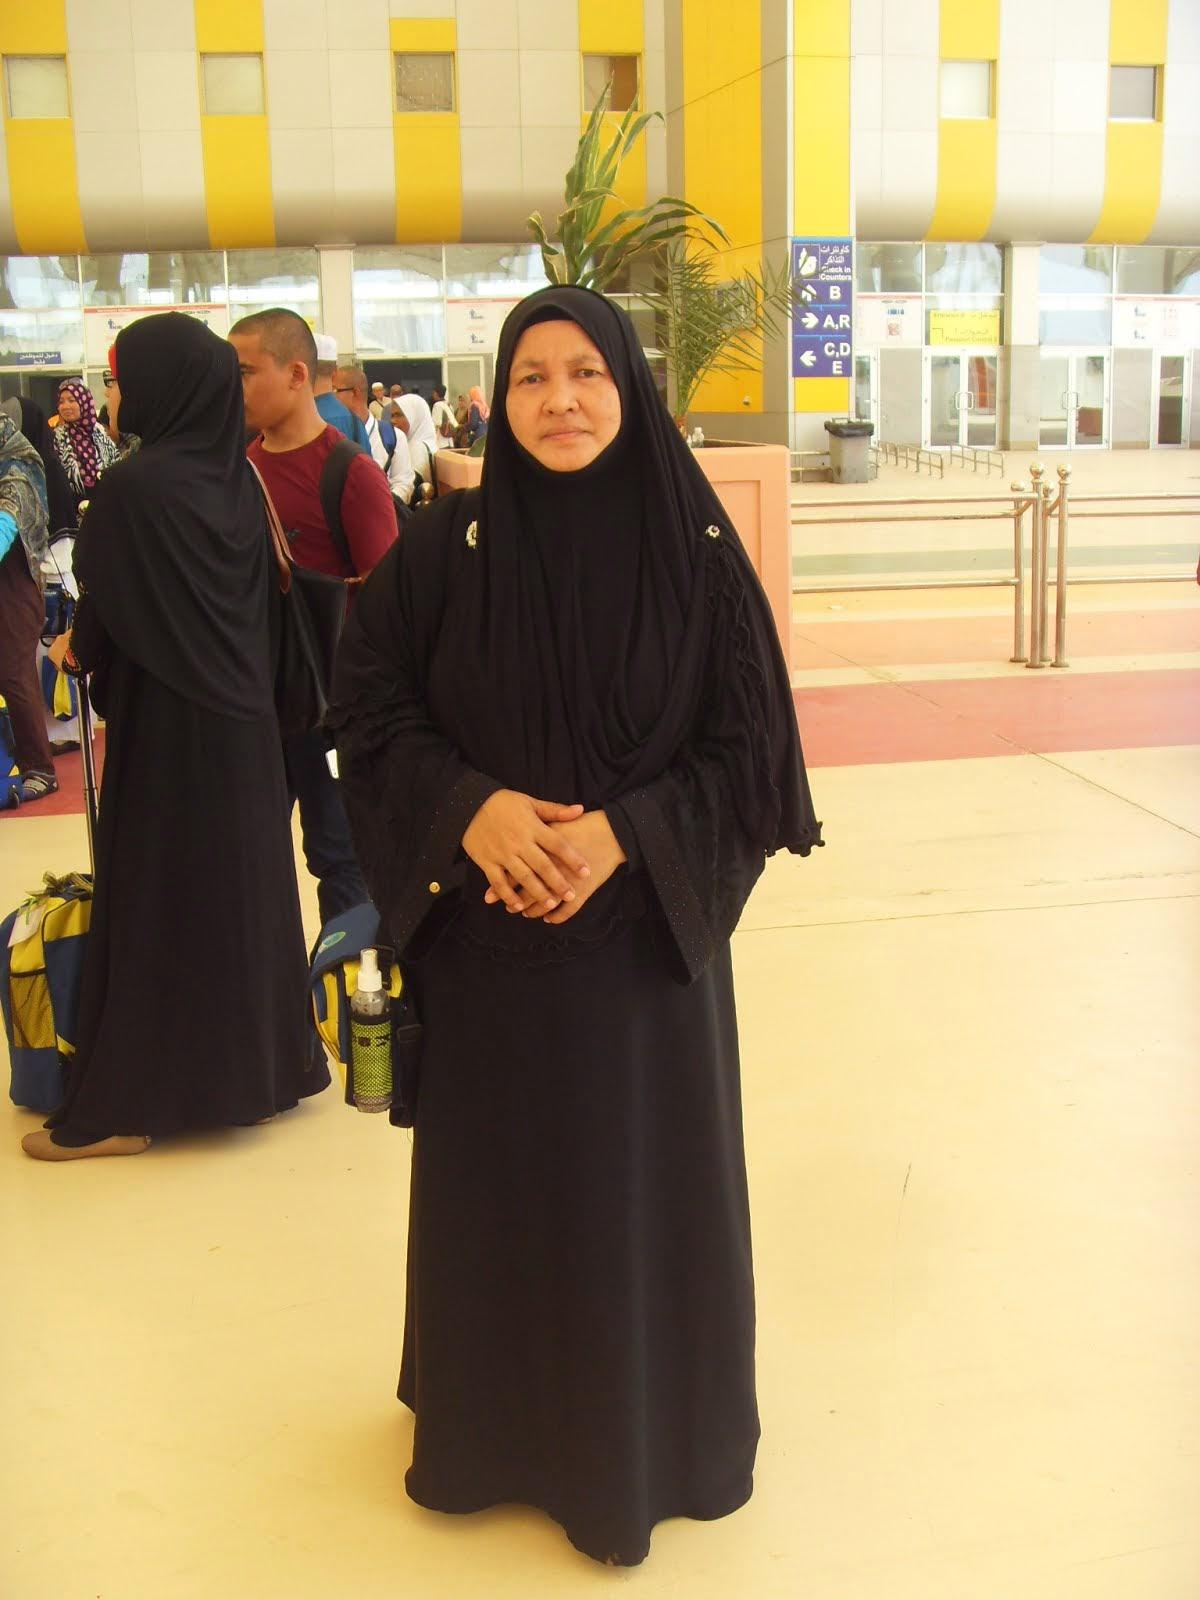 L'Terbang Jeddah